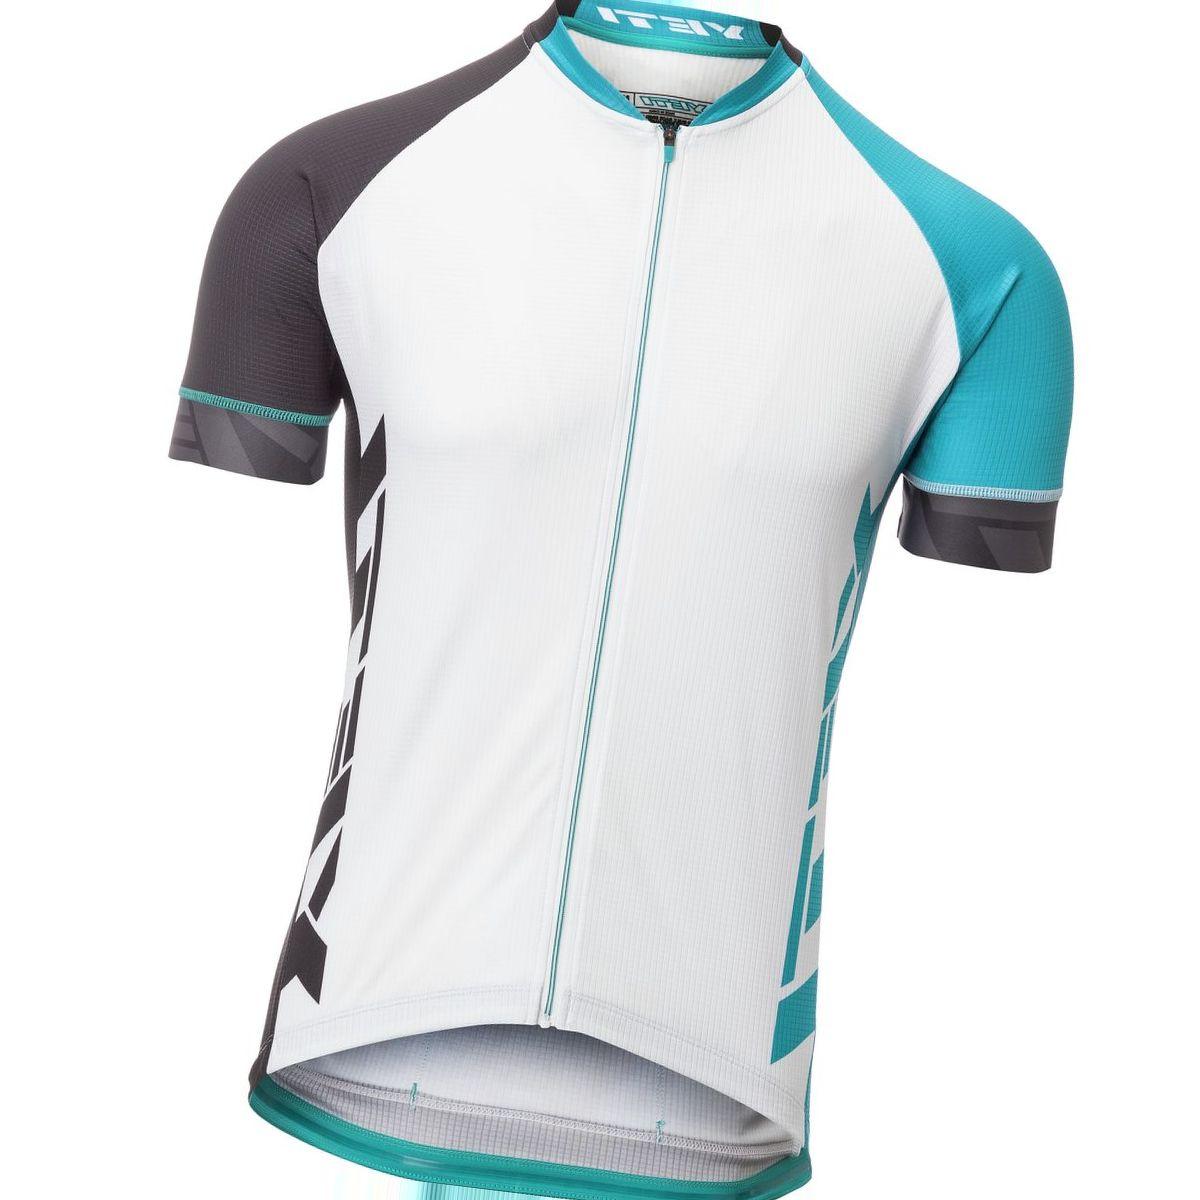 Yeti Cycles Ironton XC Short-Sleeve Jersey - Men's